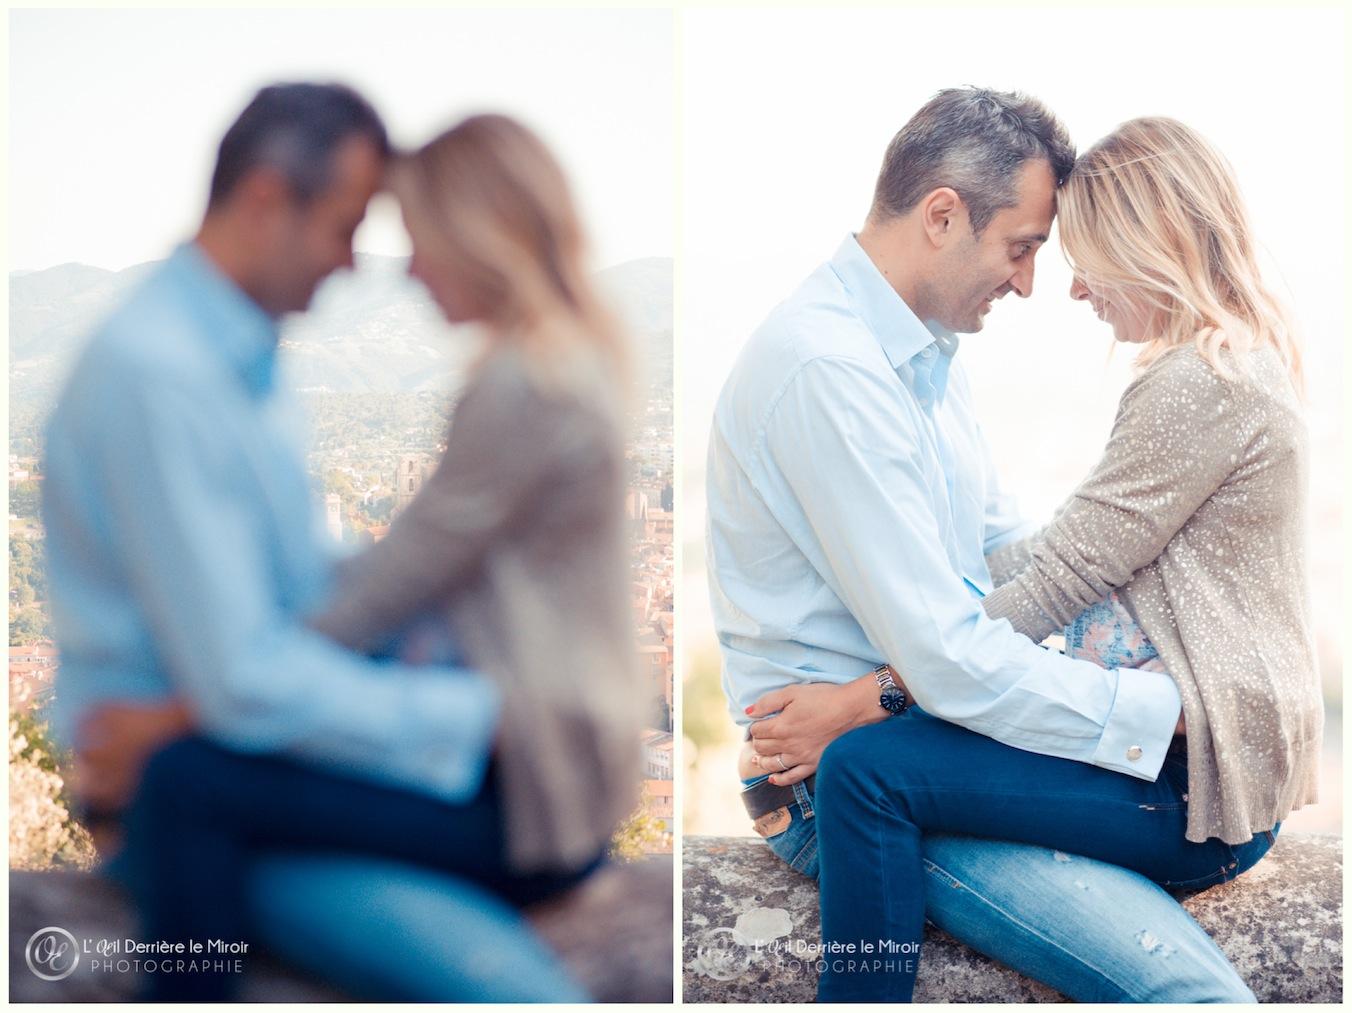 Photographe-Couple-Grasse-dj06